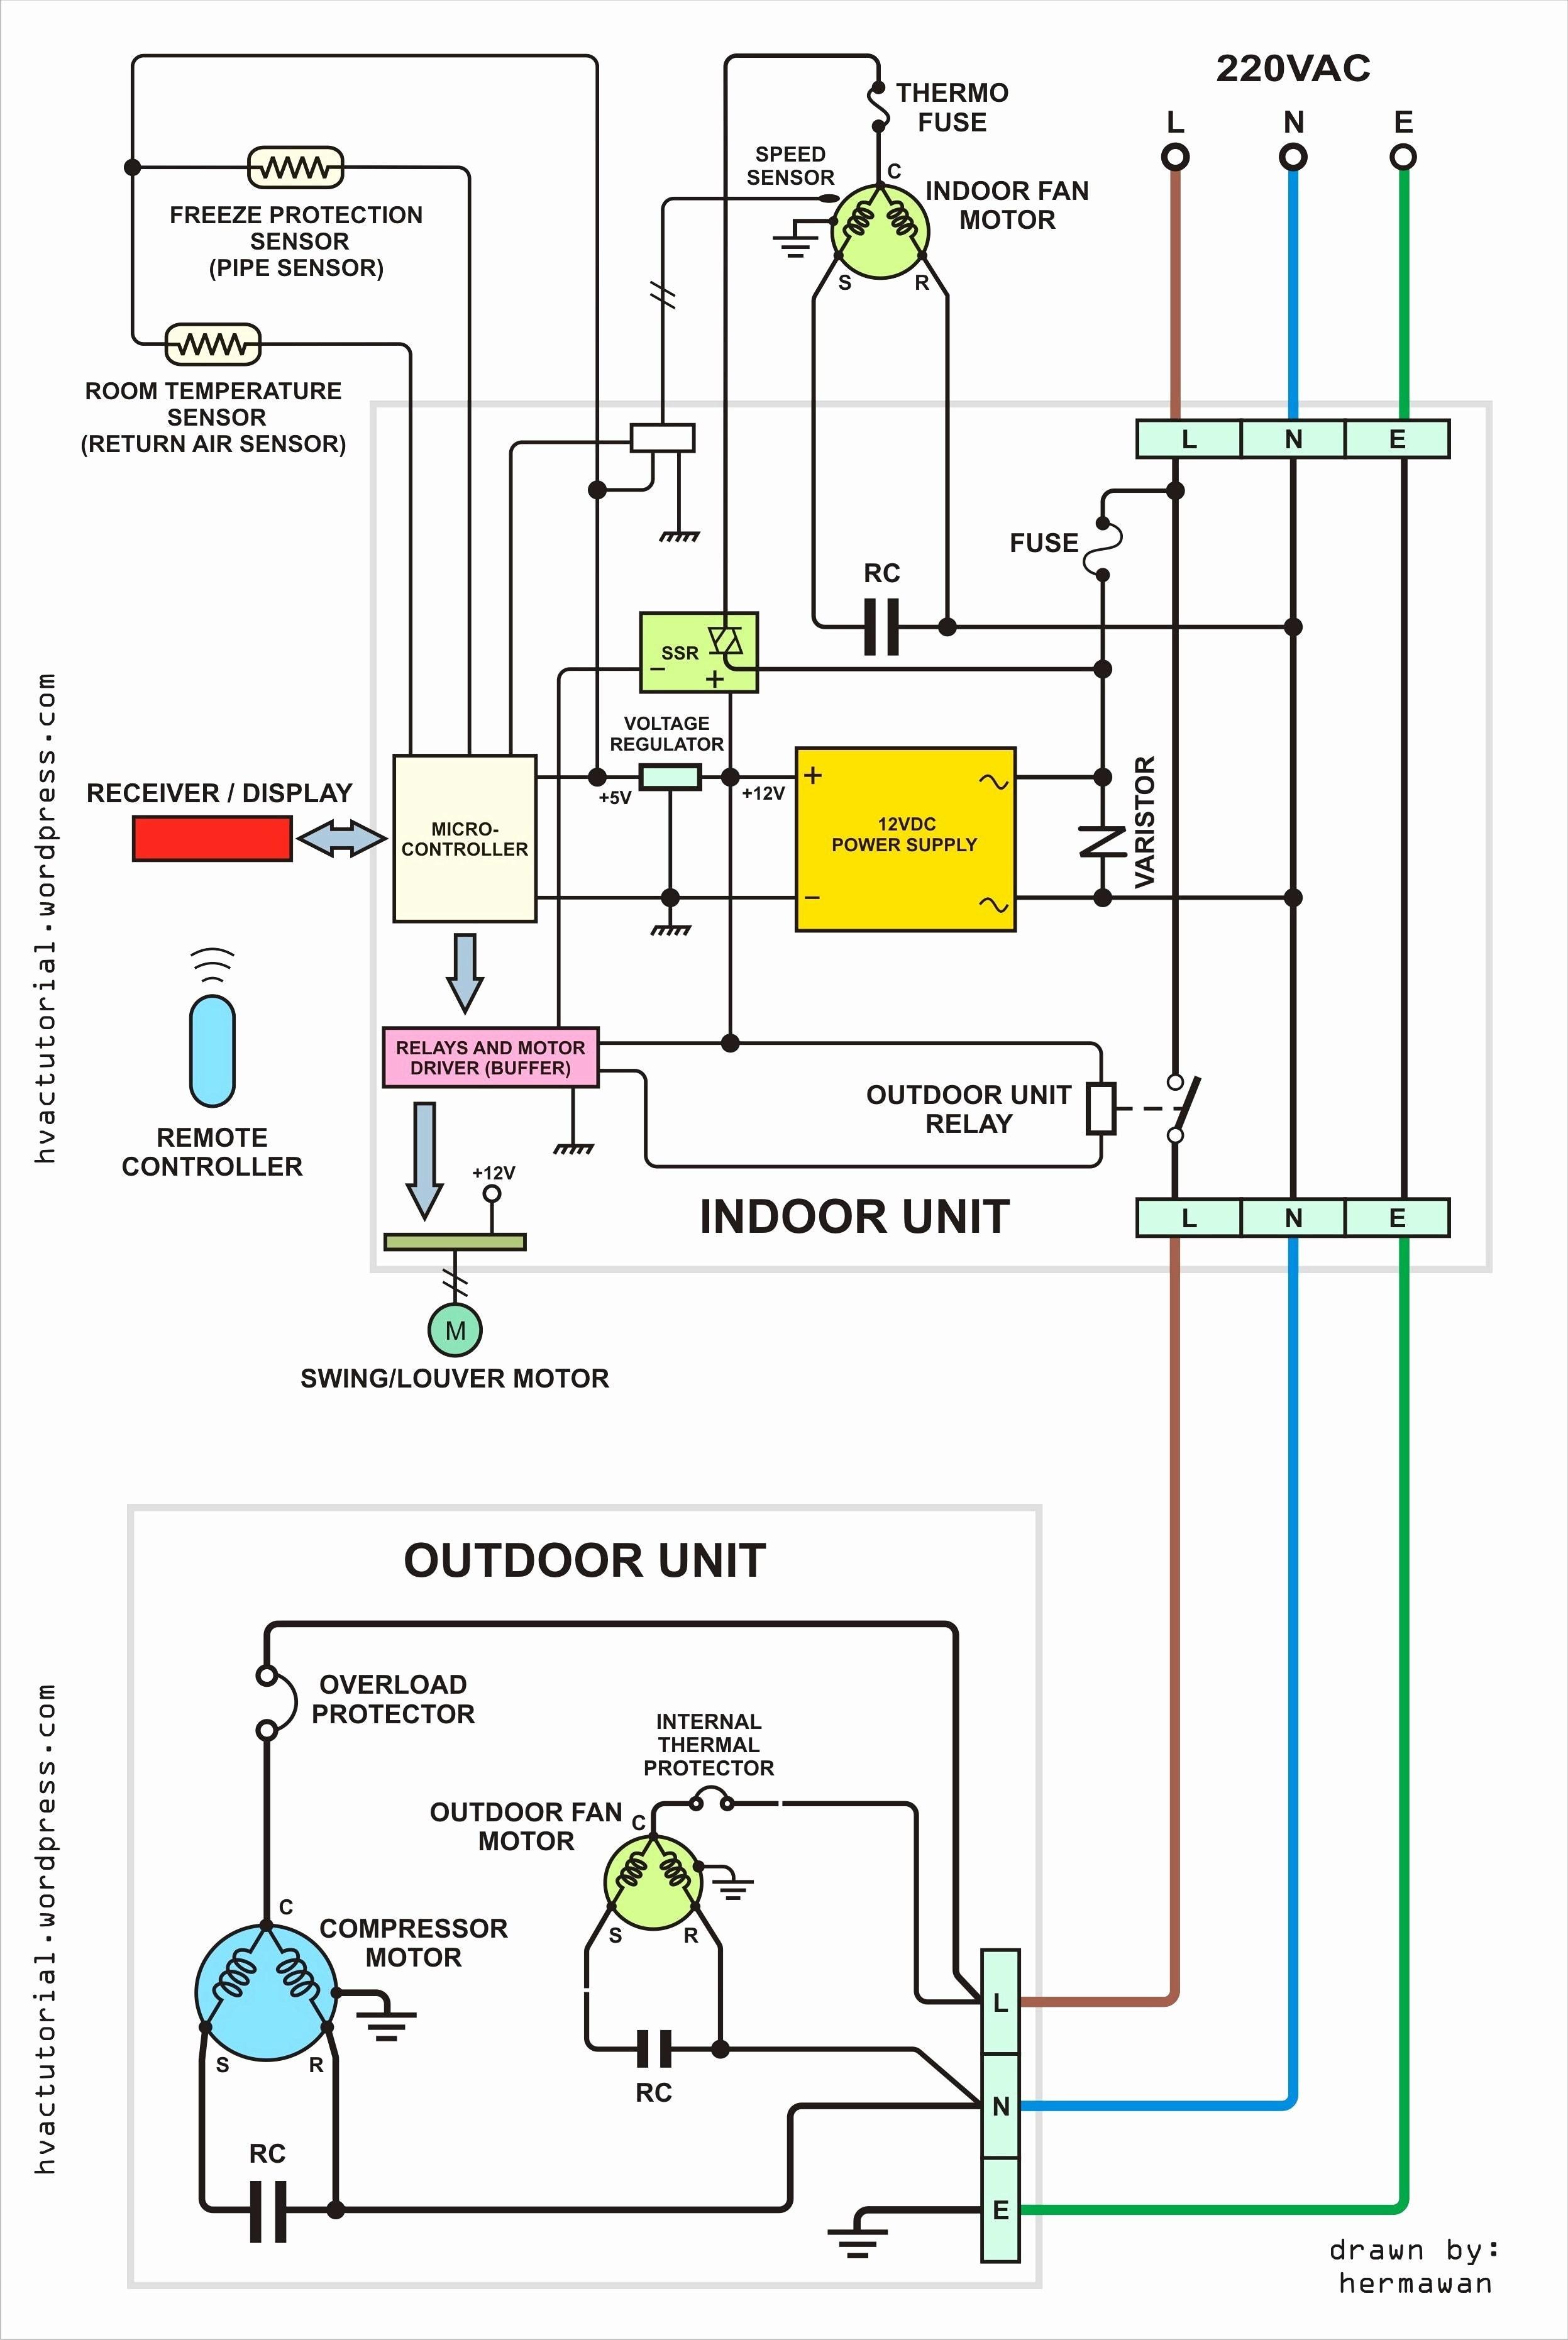 Excellent Wiring Diagram Ac Kaset Wiring Diagram G11 Wiring Cloud Lukepaidewilluminateatxorg